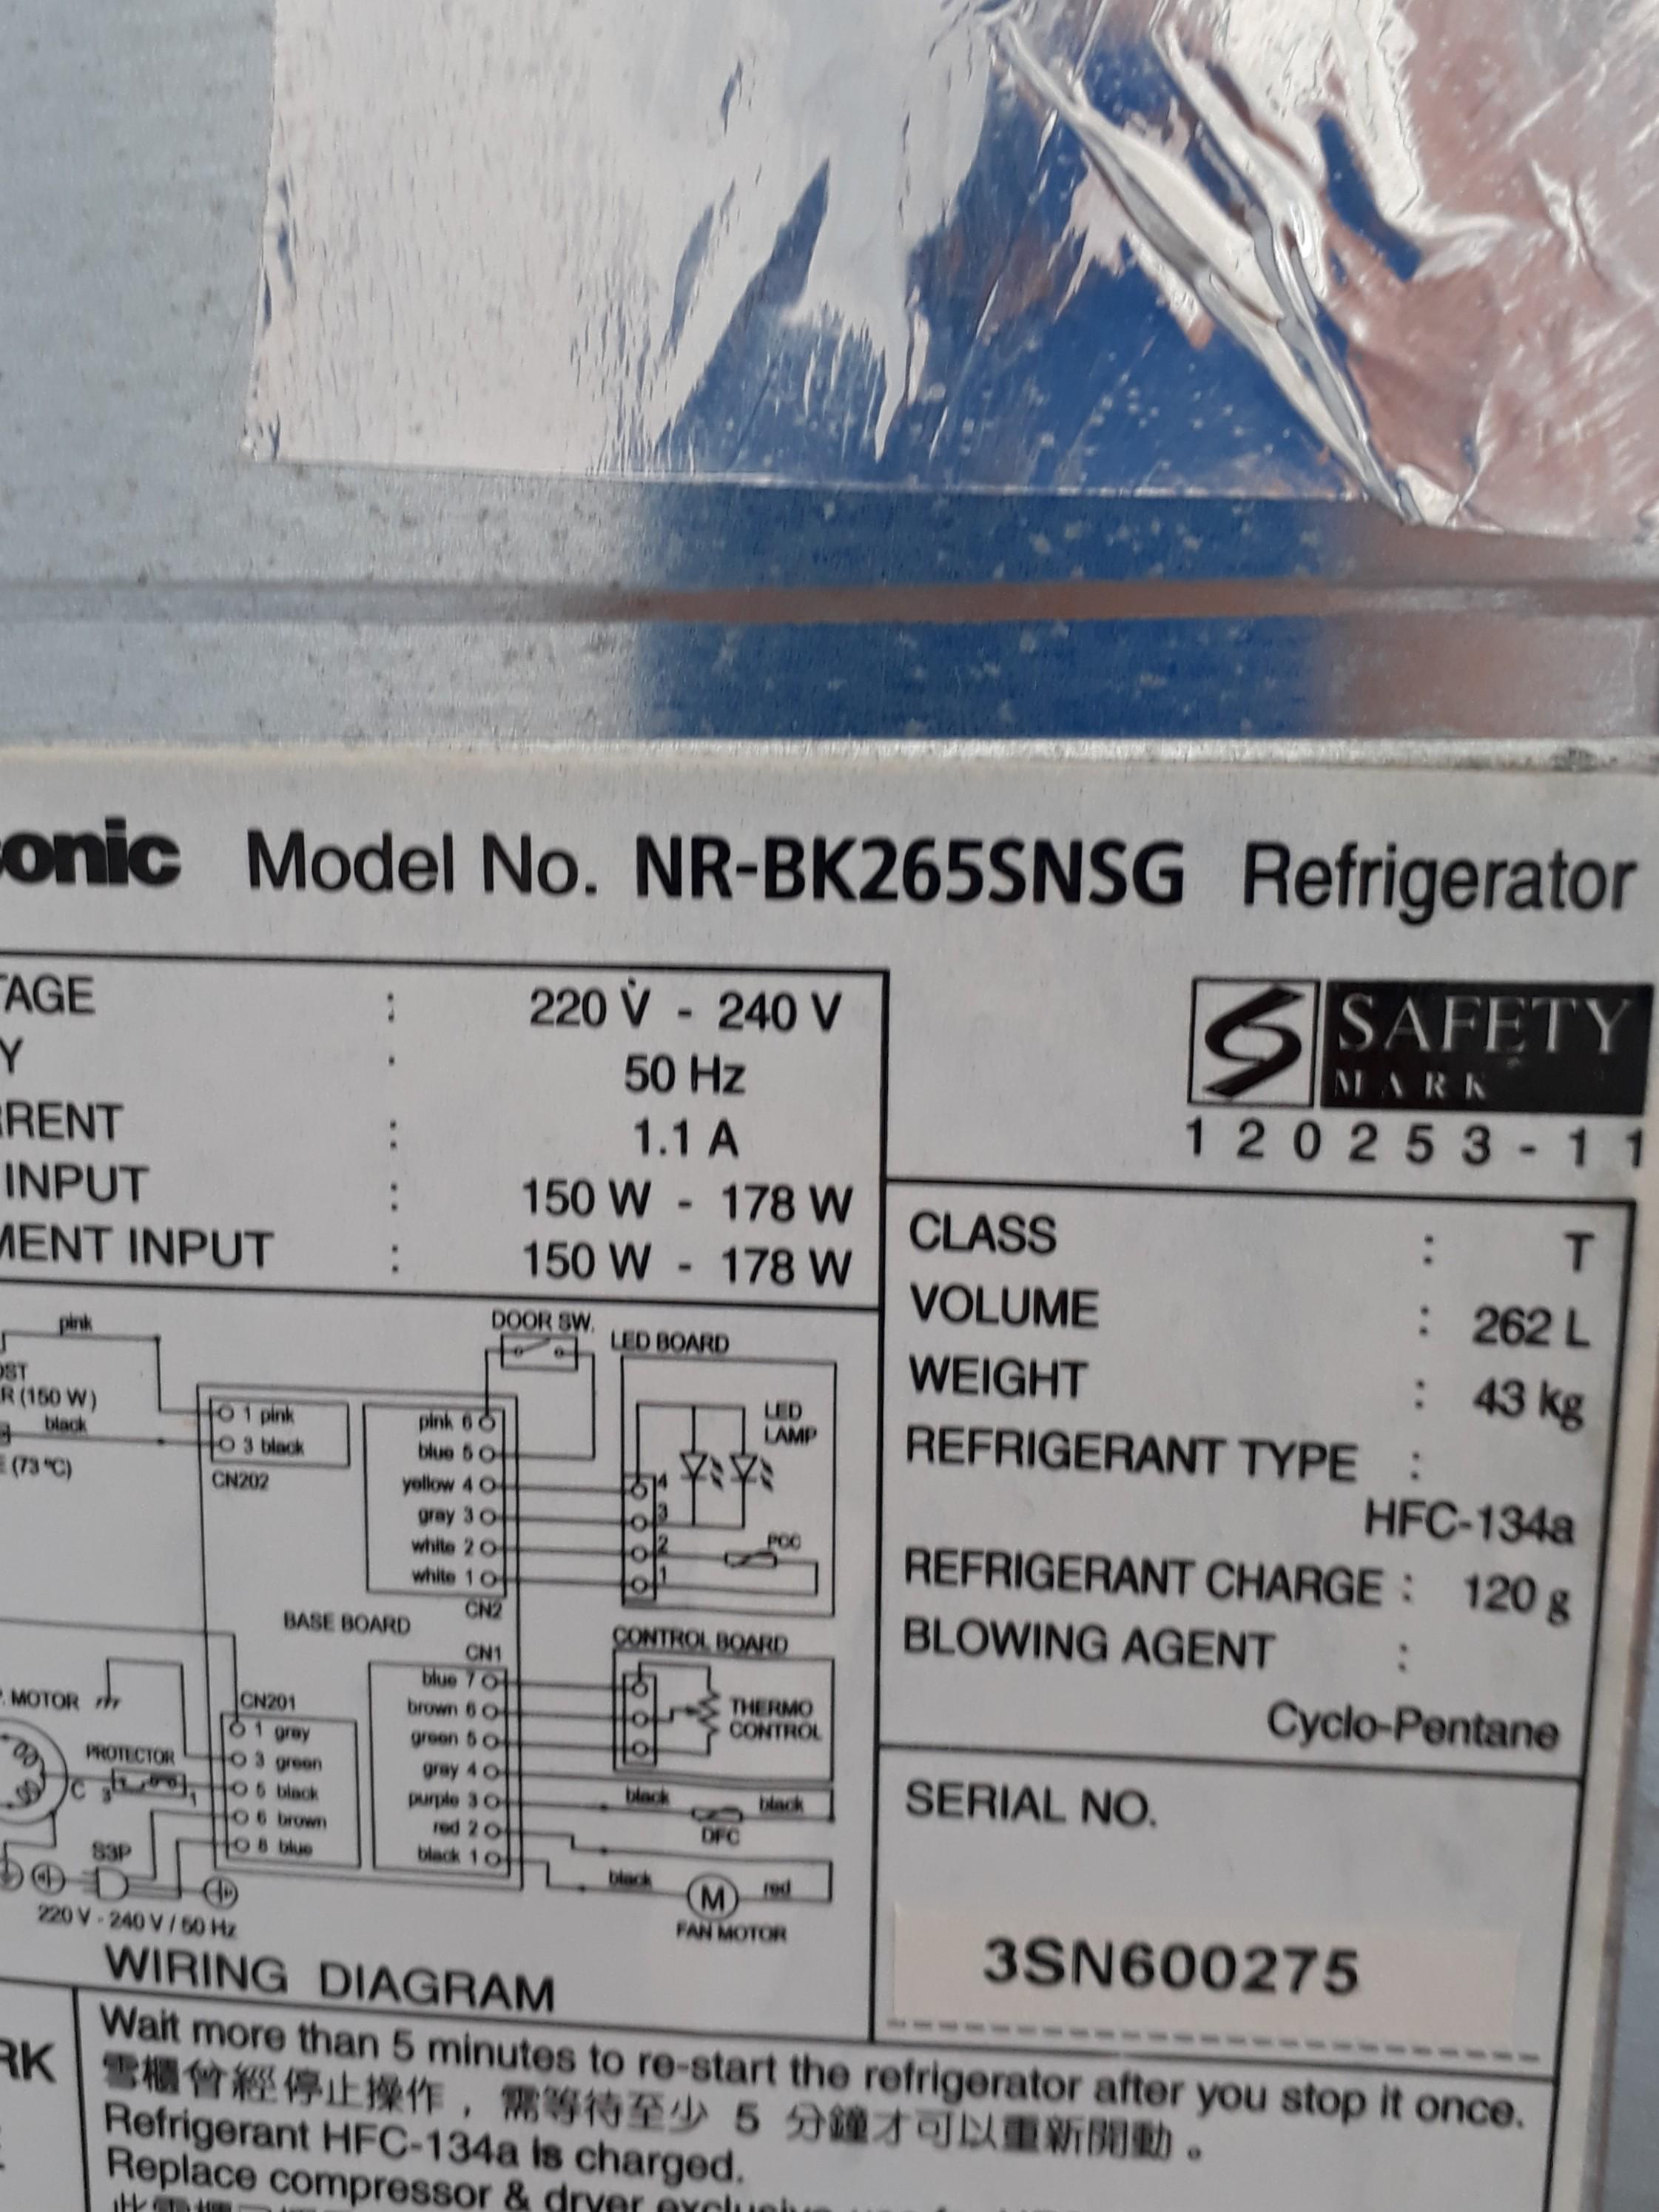 panasonic refrigerator 262 litre home appliances cooling air